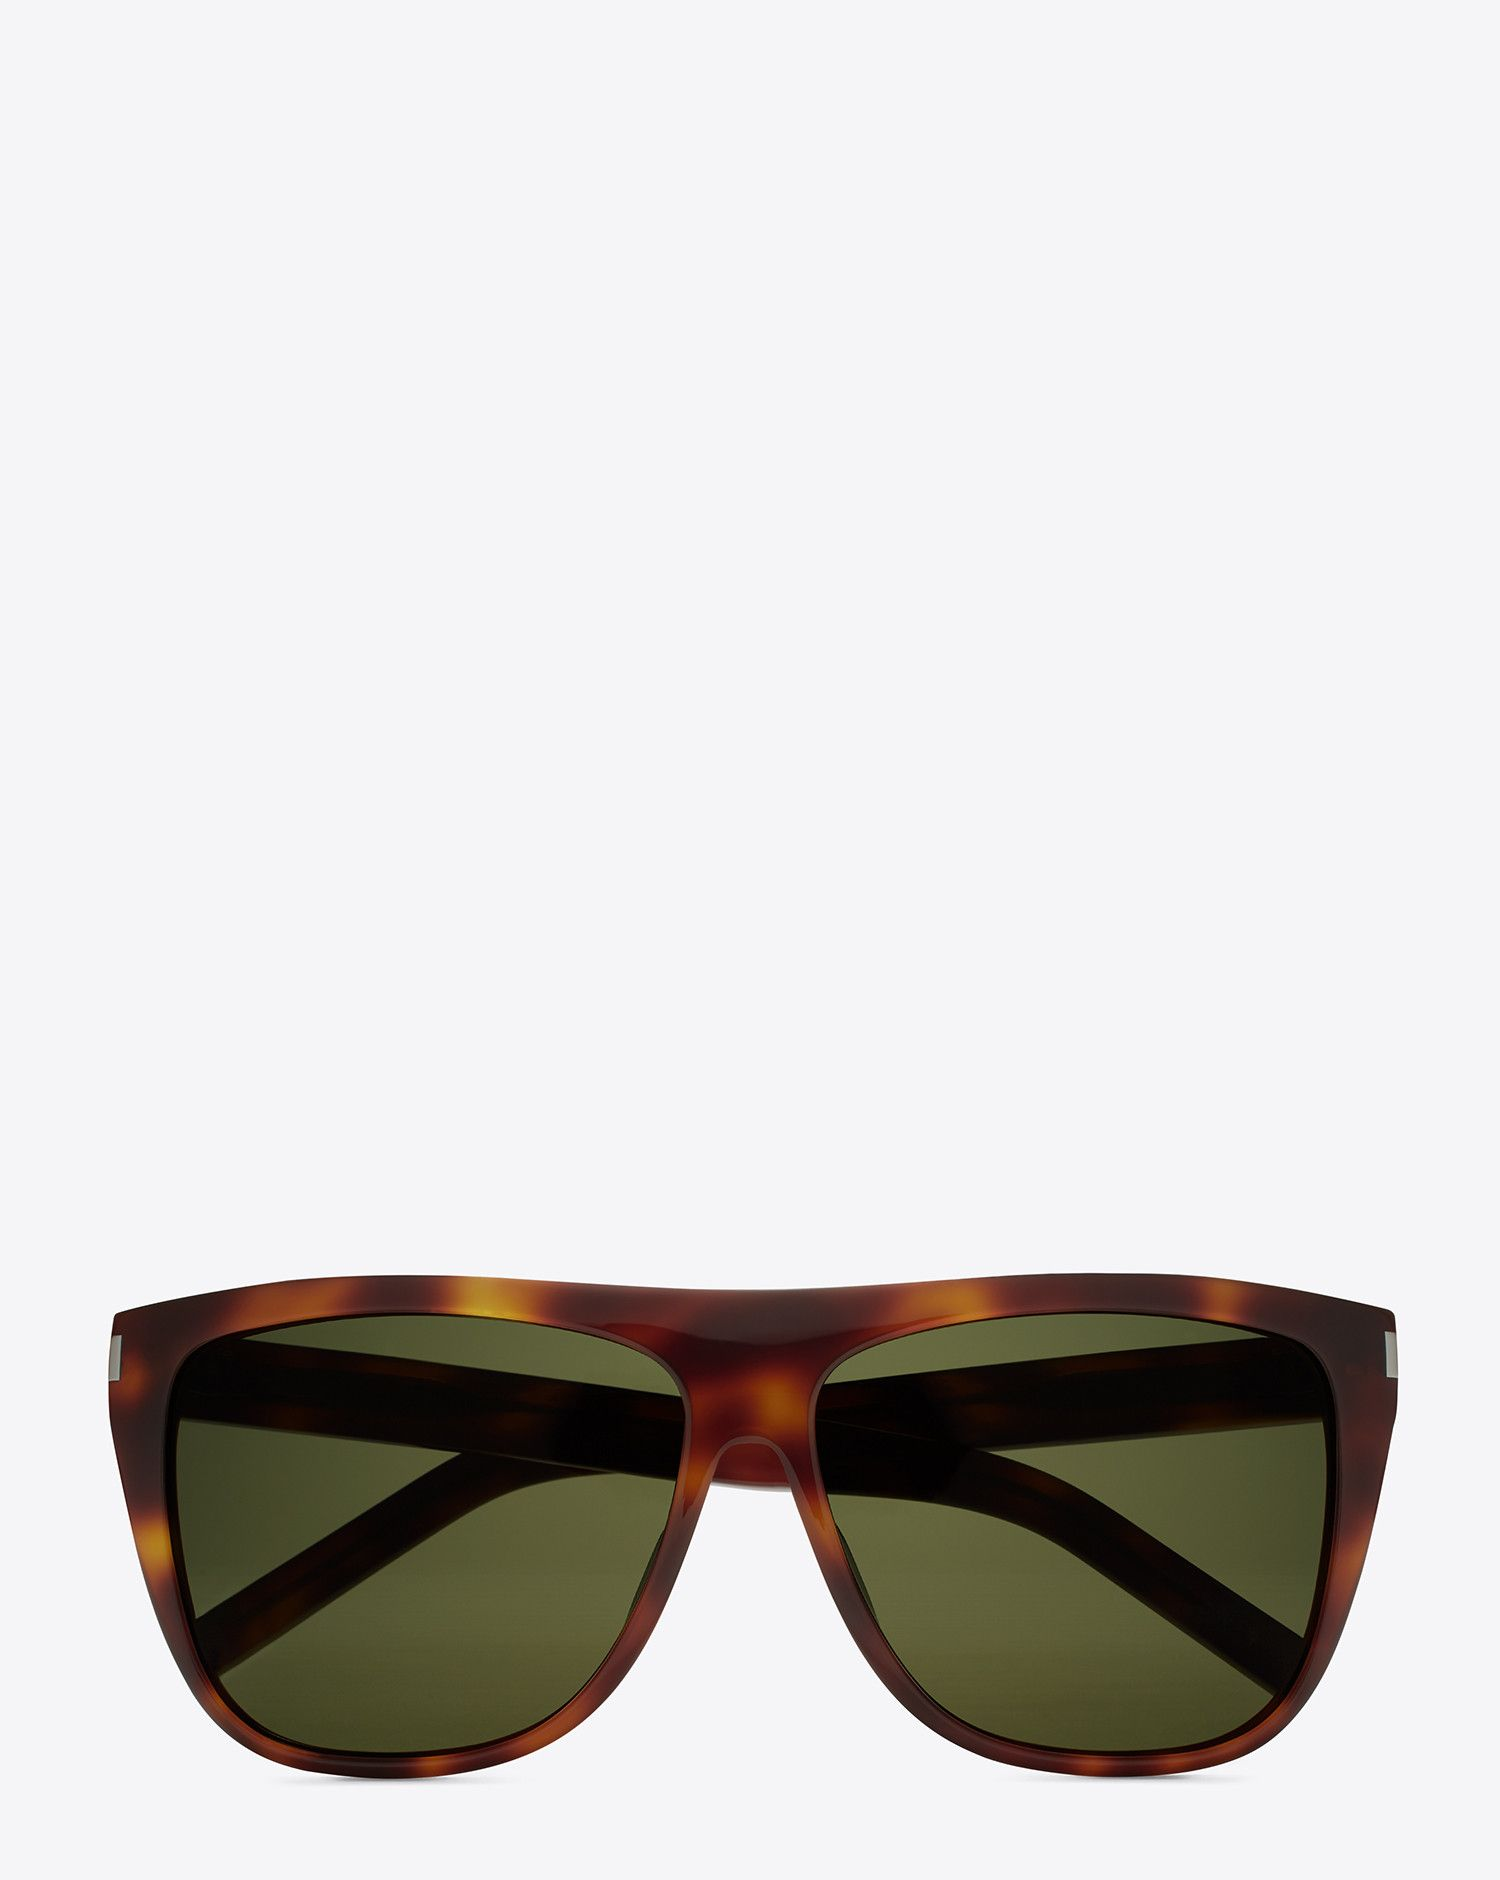 Unisex Sunglasses in Havana Acetate Saint Laurent Manchester Online Cheap Newest Lg9891WKk